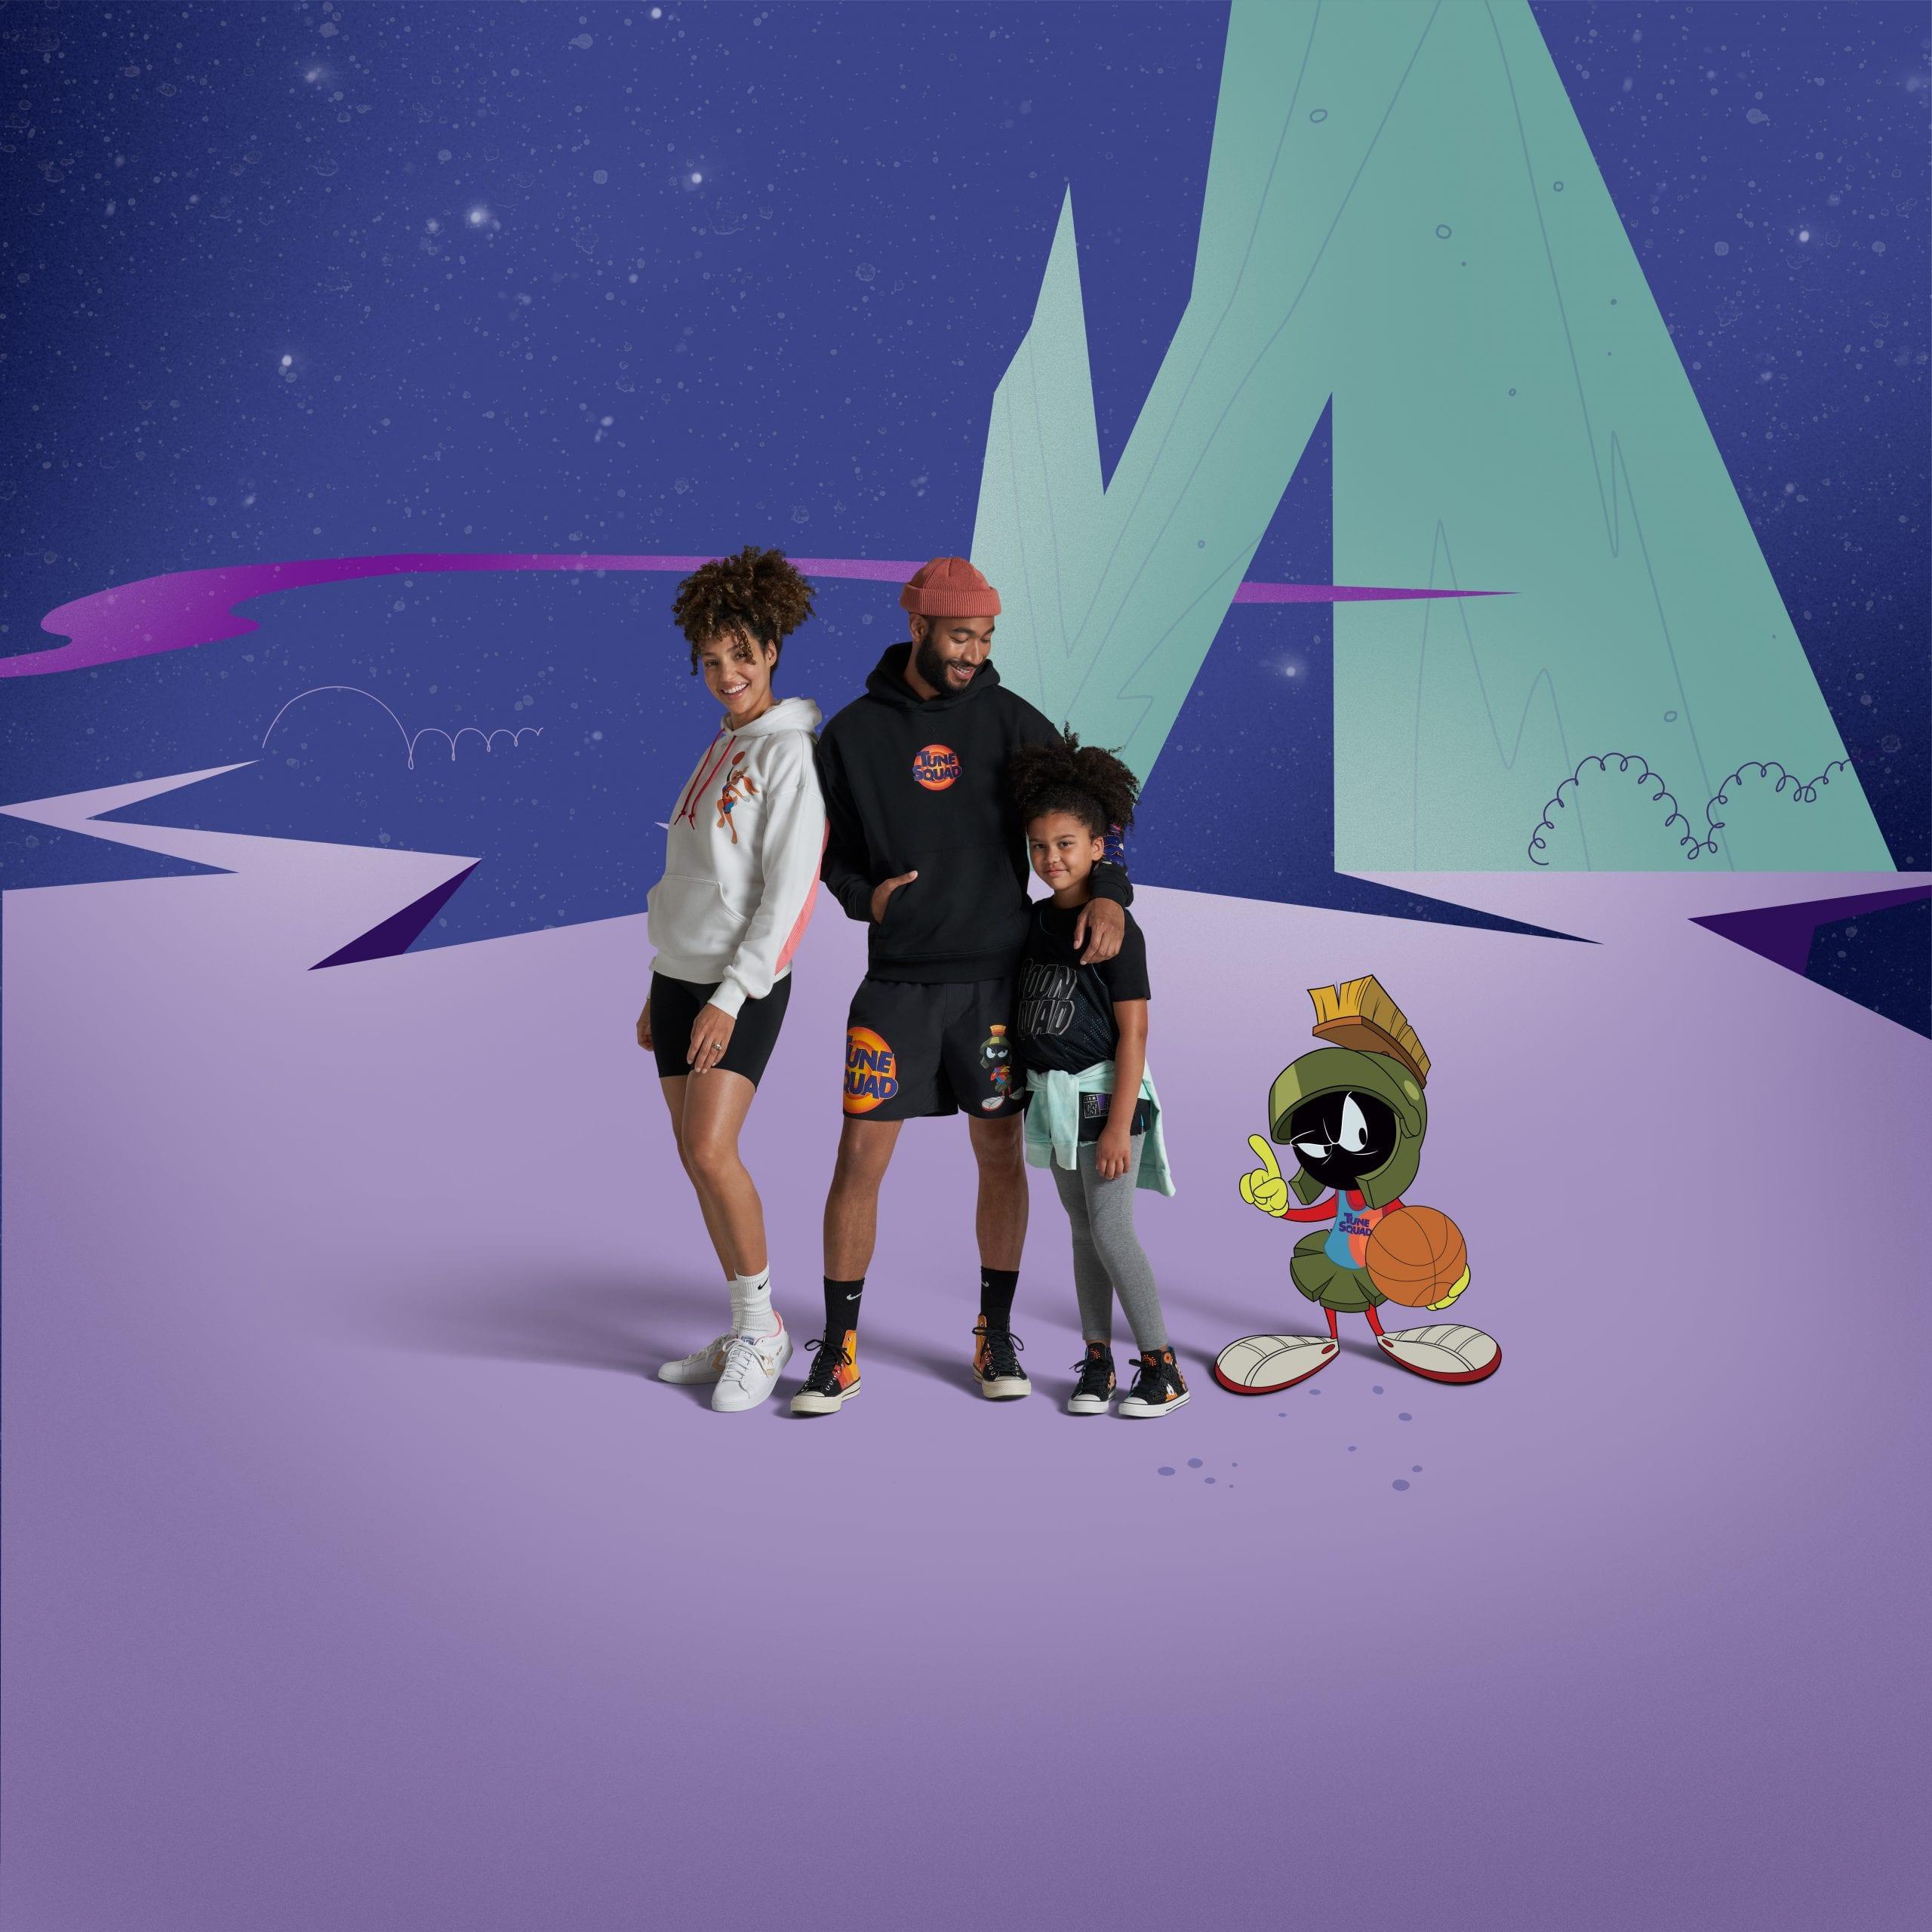 Converse x Space Jam: A New Legacy / Μία νέα limited edition συλλογή